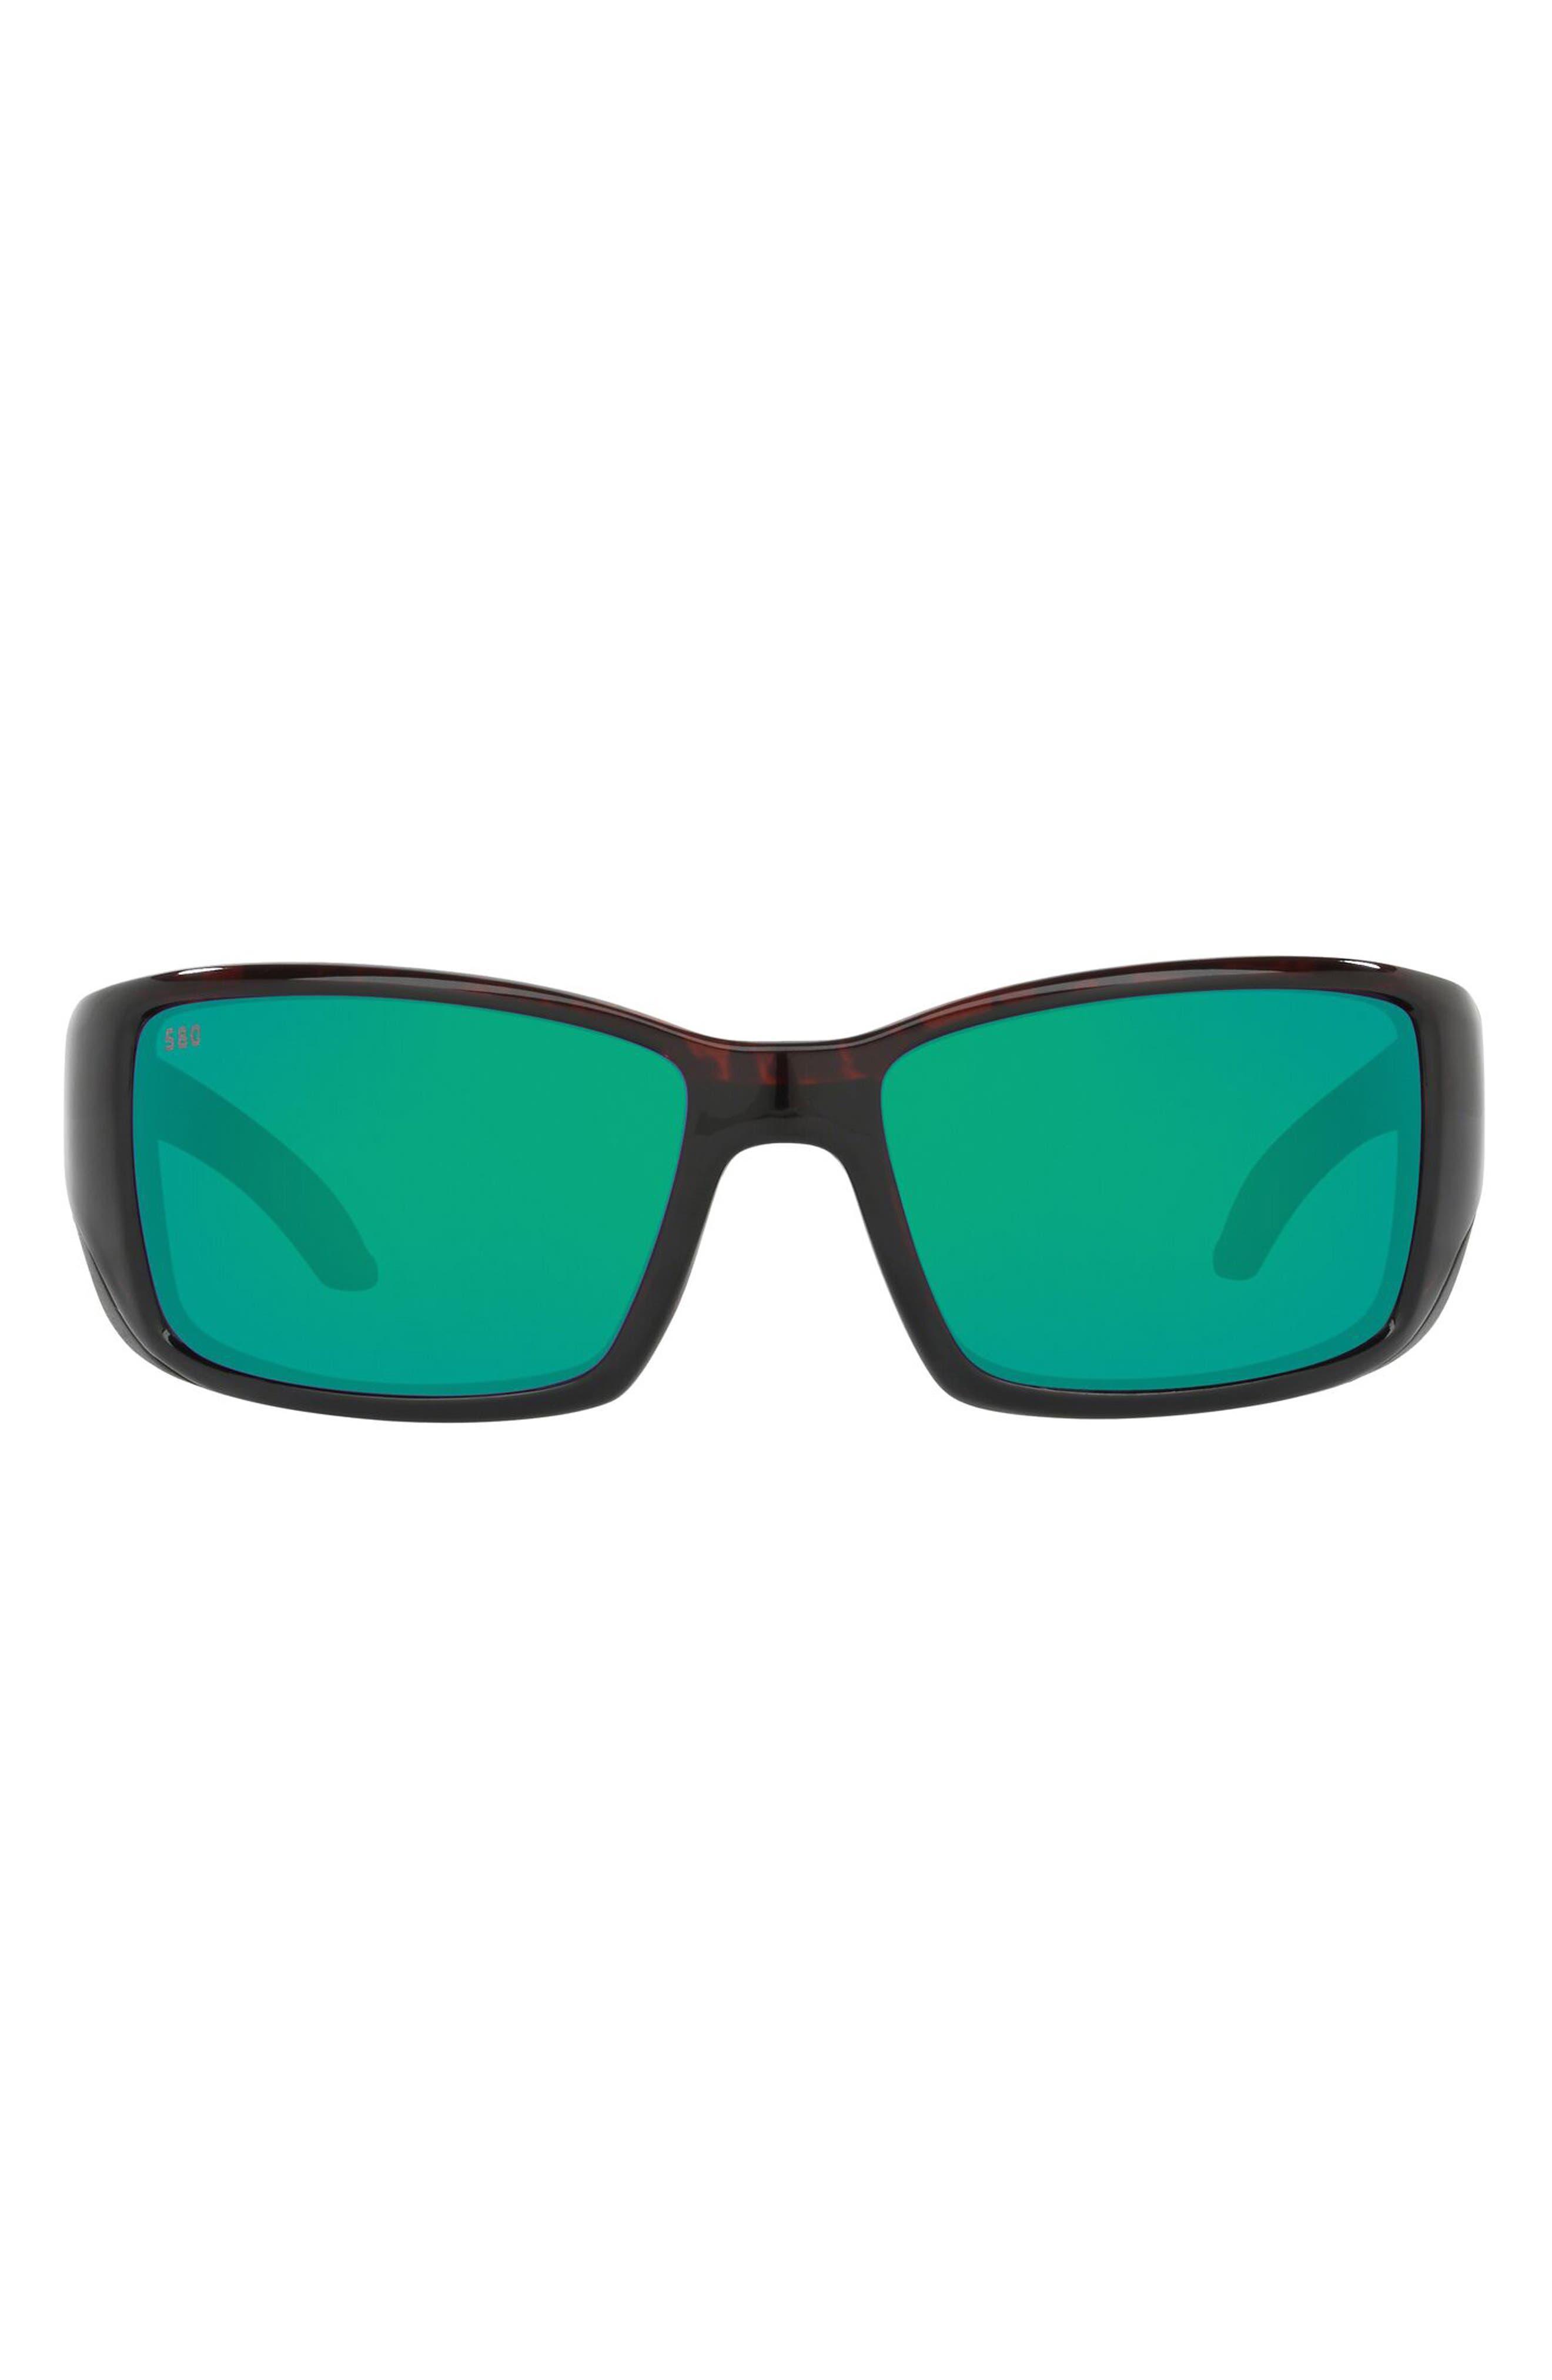 62mm Rectangular Polarized Sunglasses